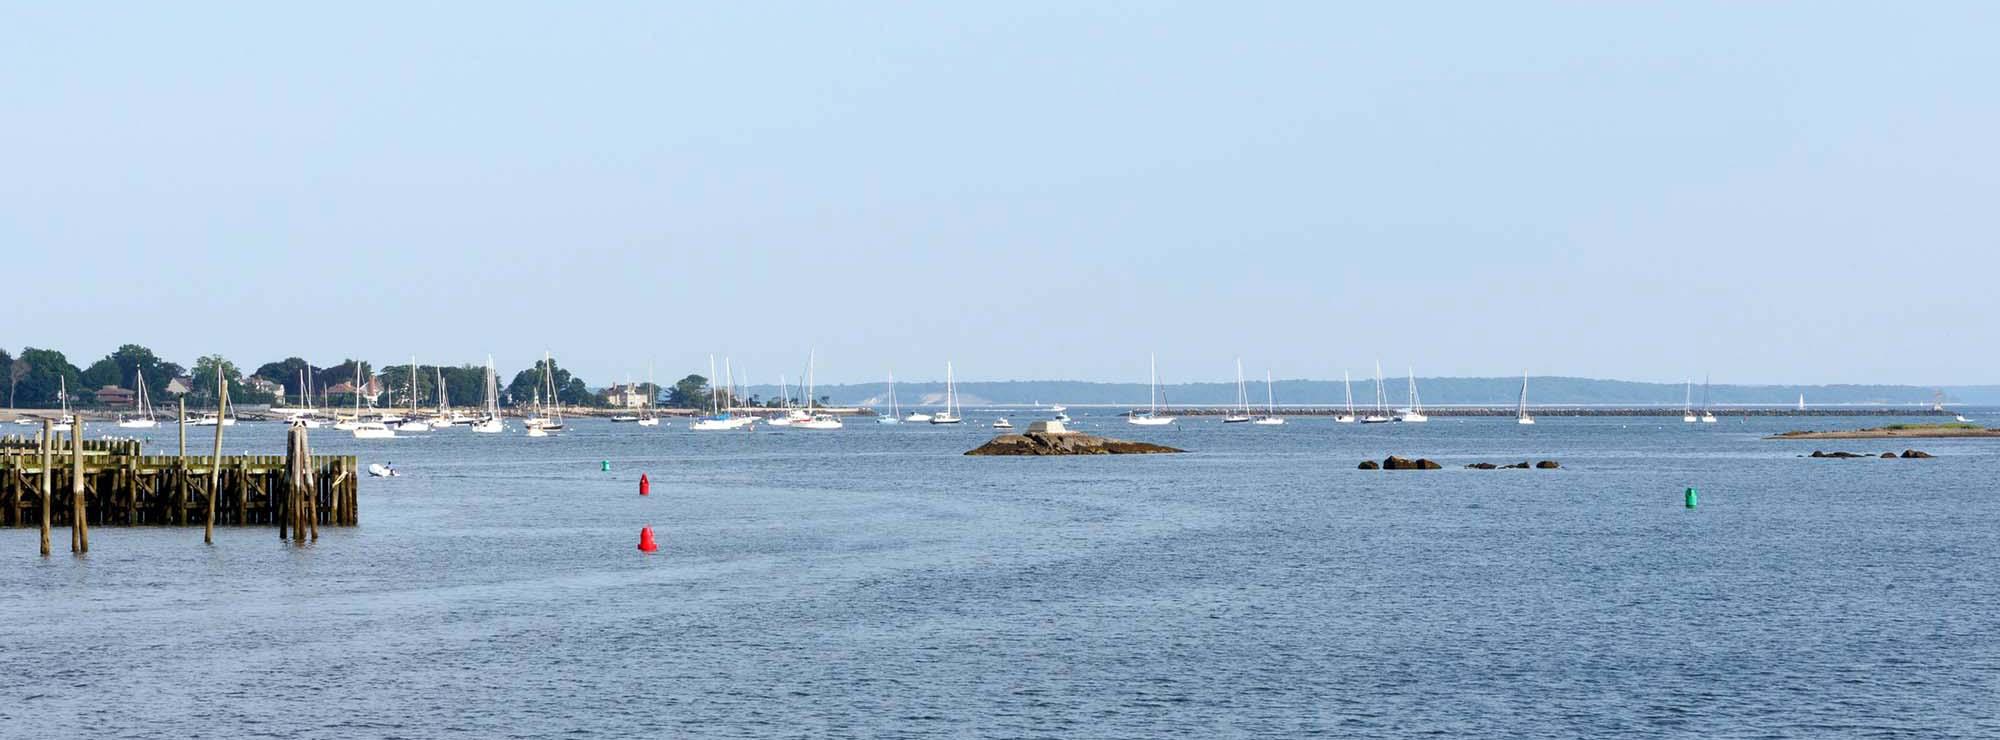 Connecticut Coastal Seascape along the Long Island Sound